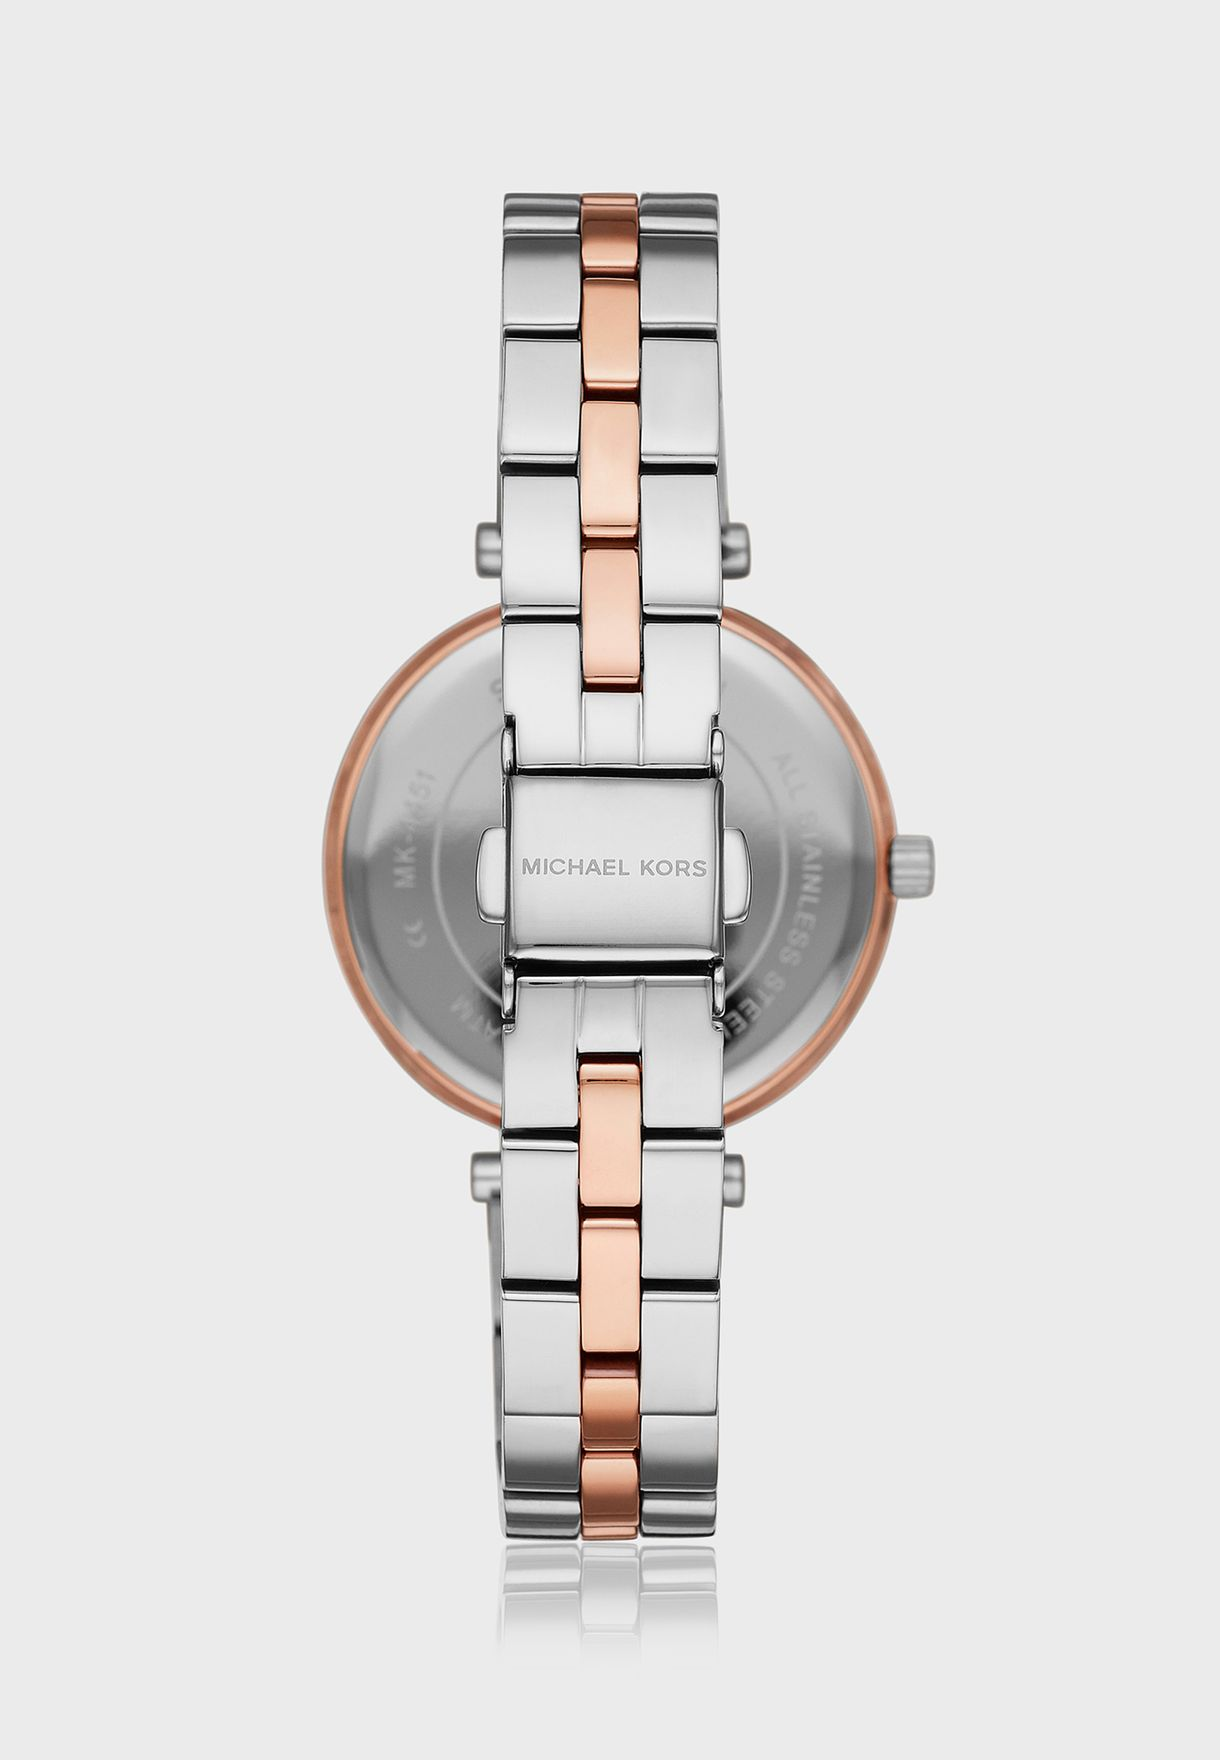 MK4452 Maci Analog Watch